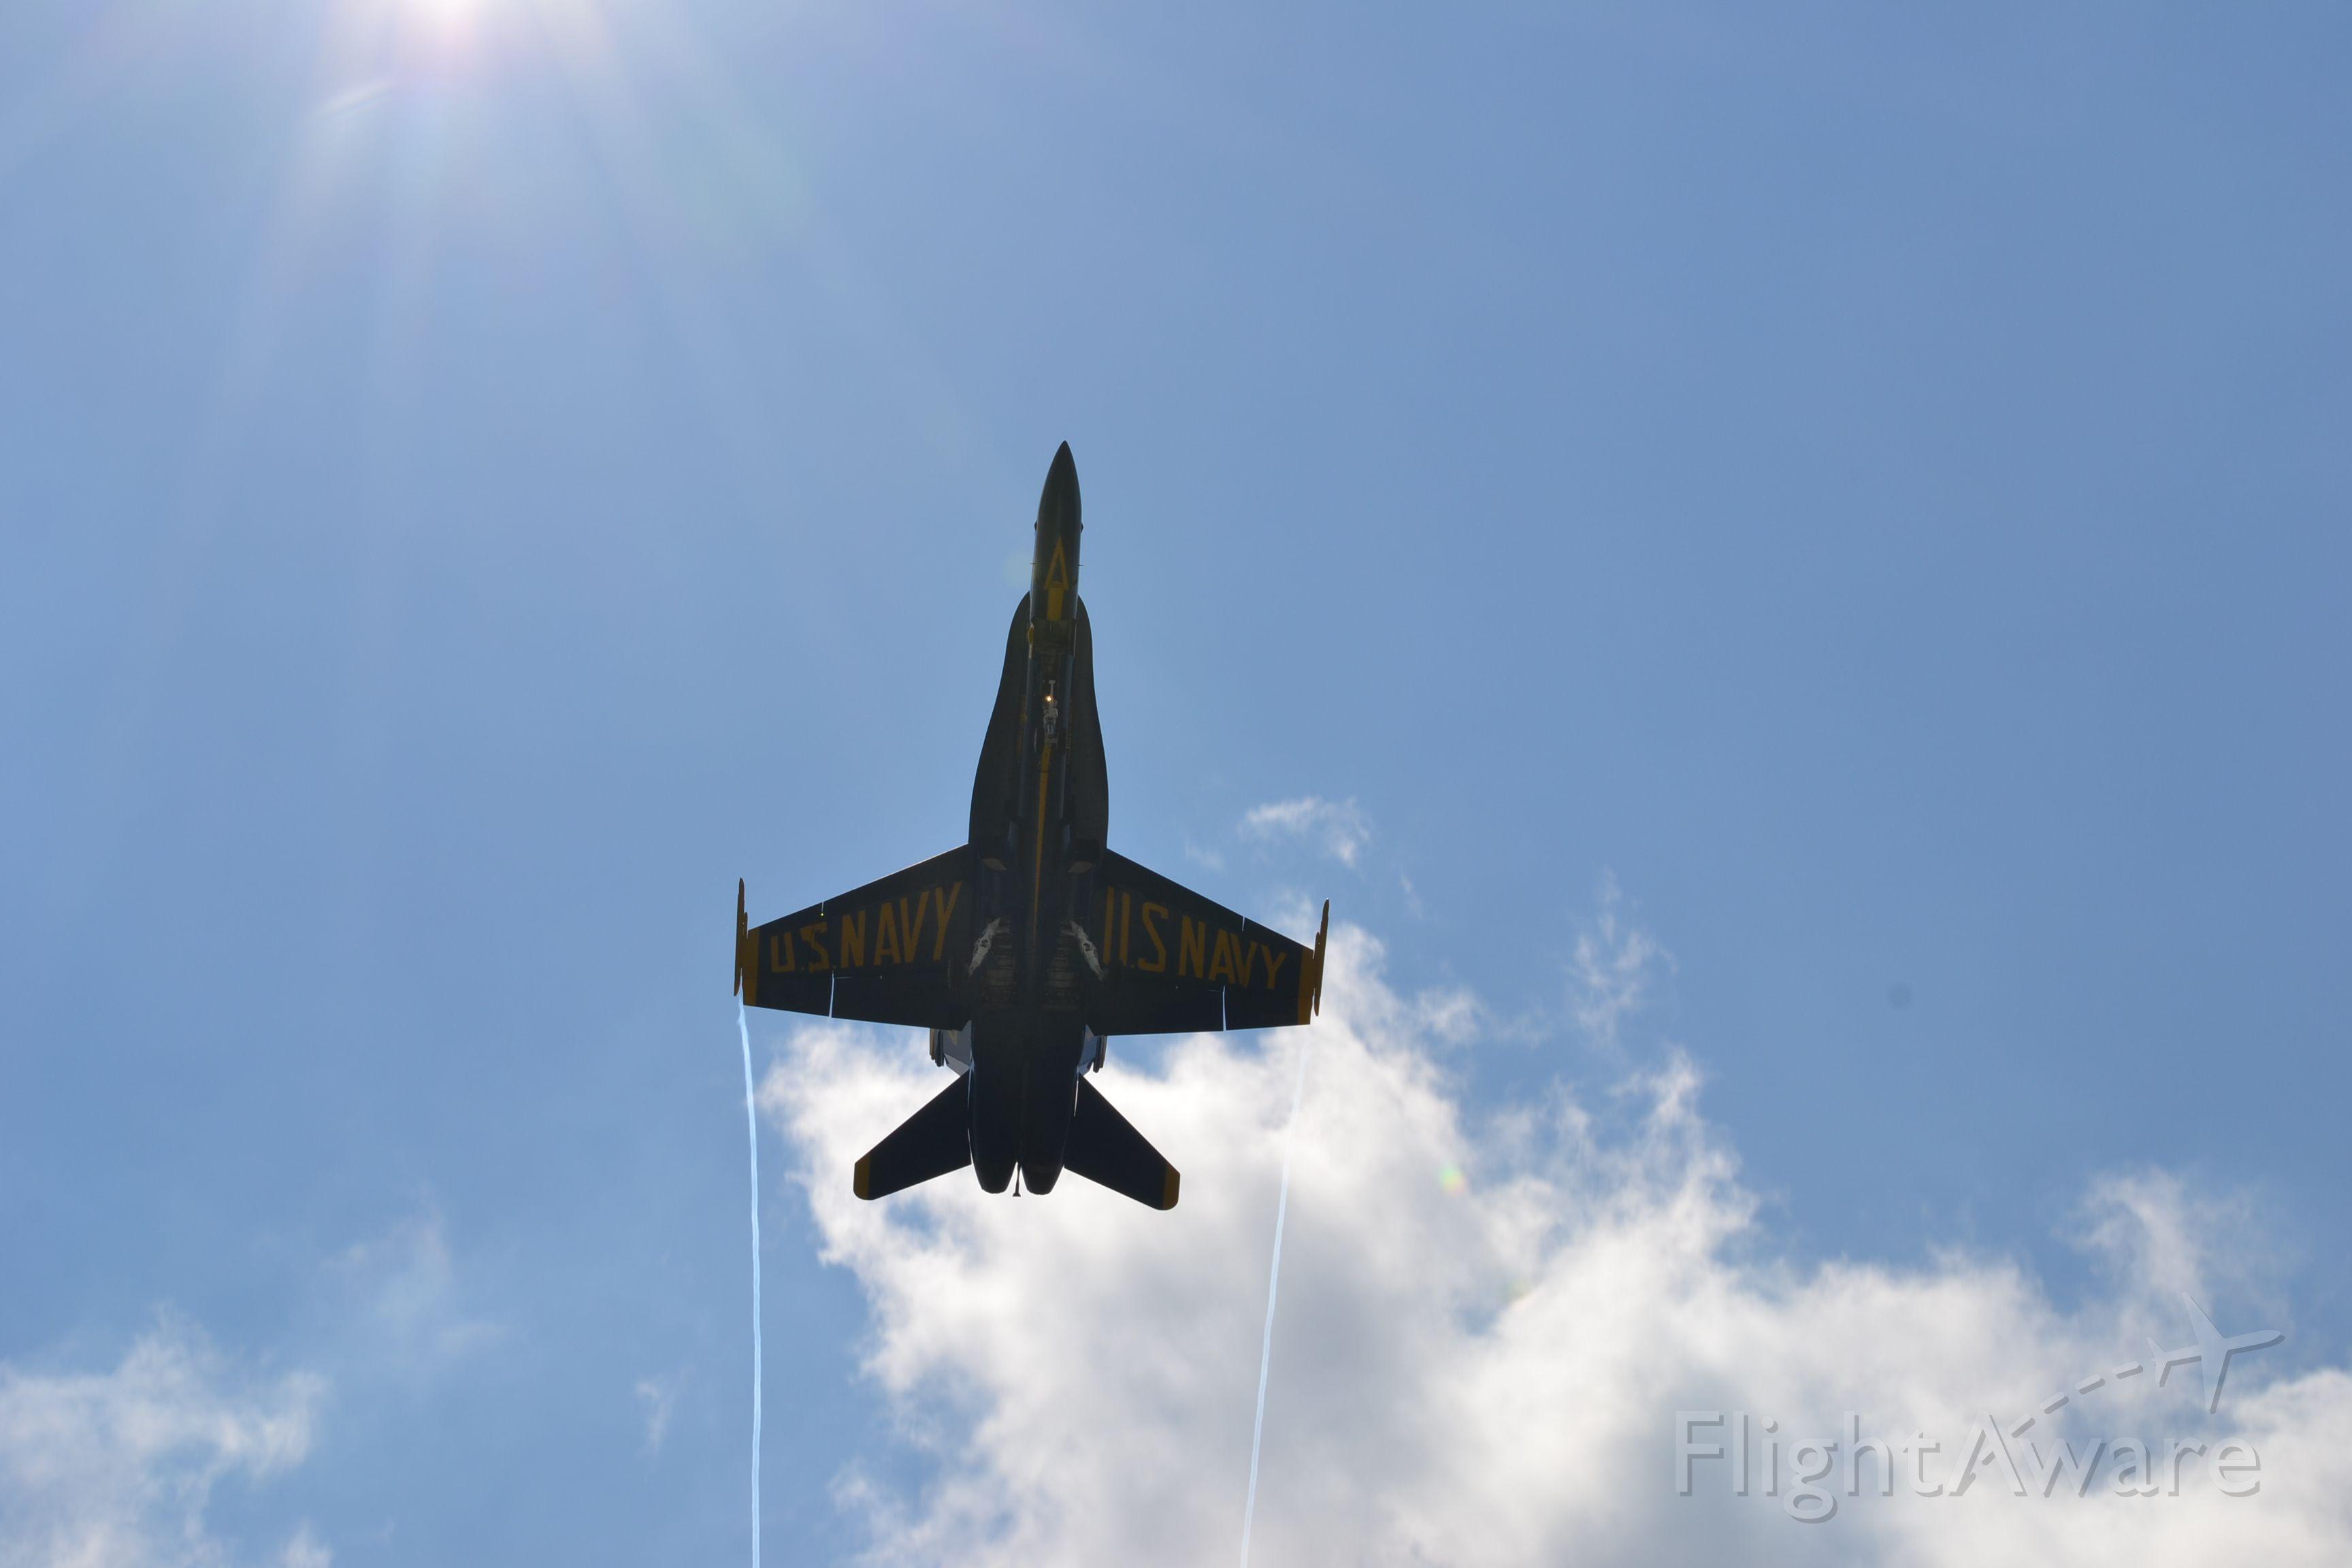 McDonnell Douglas FA-18 Hornet — - Blue Angel on approach to KBOS, War of 1812 commemoration 2012